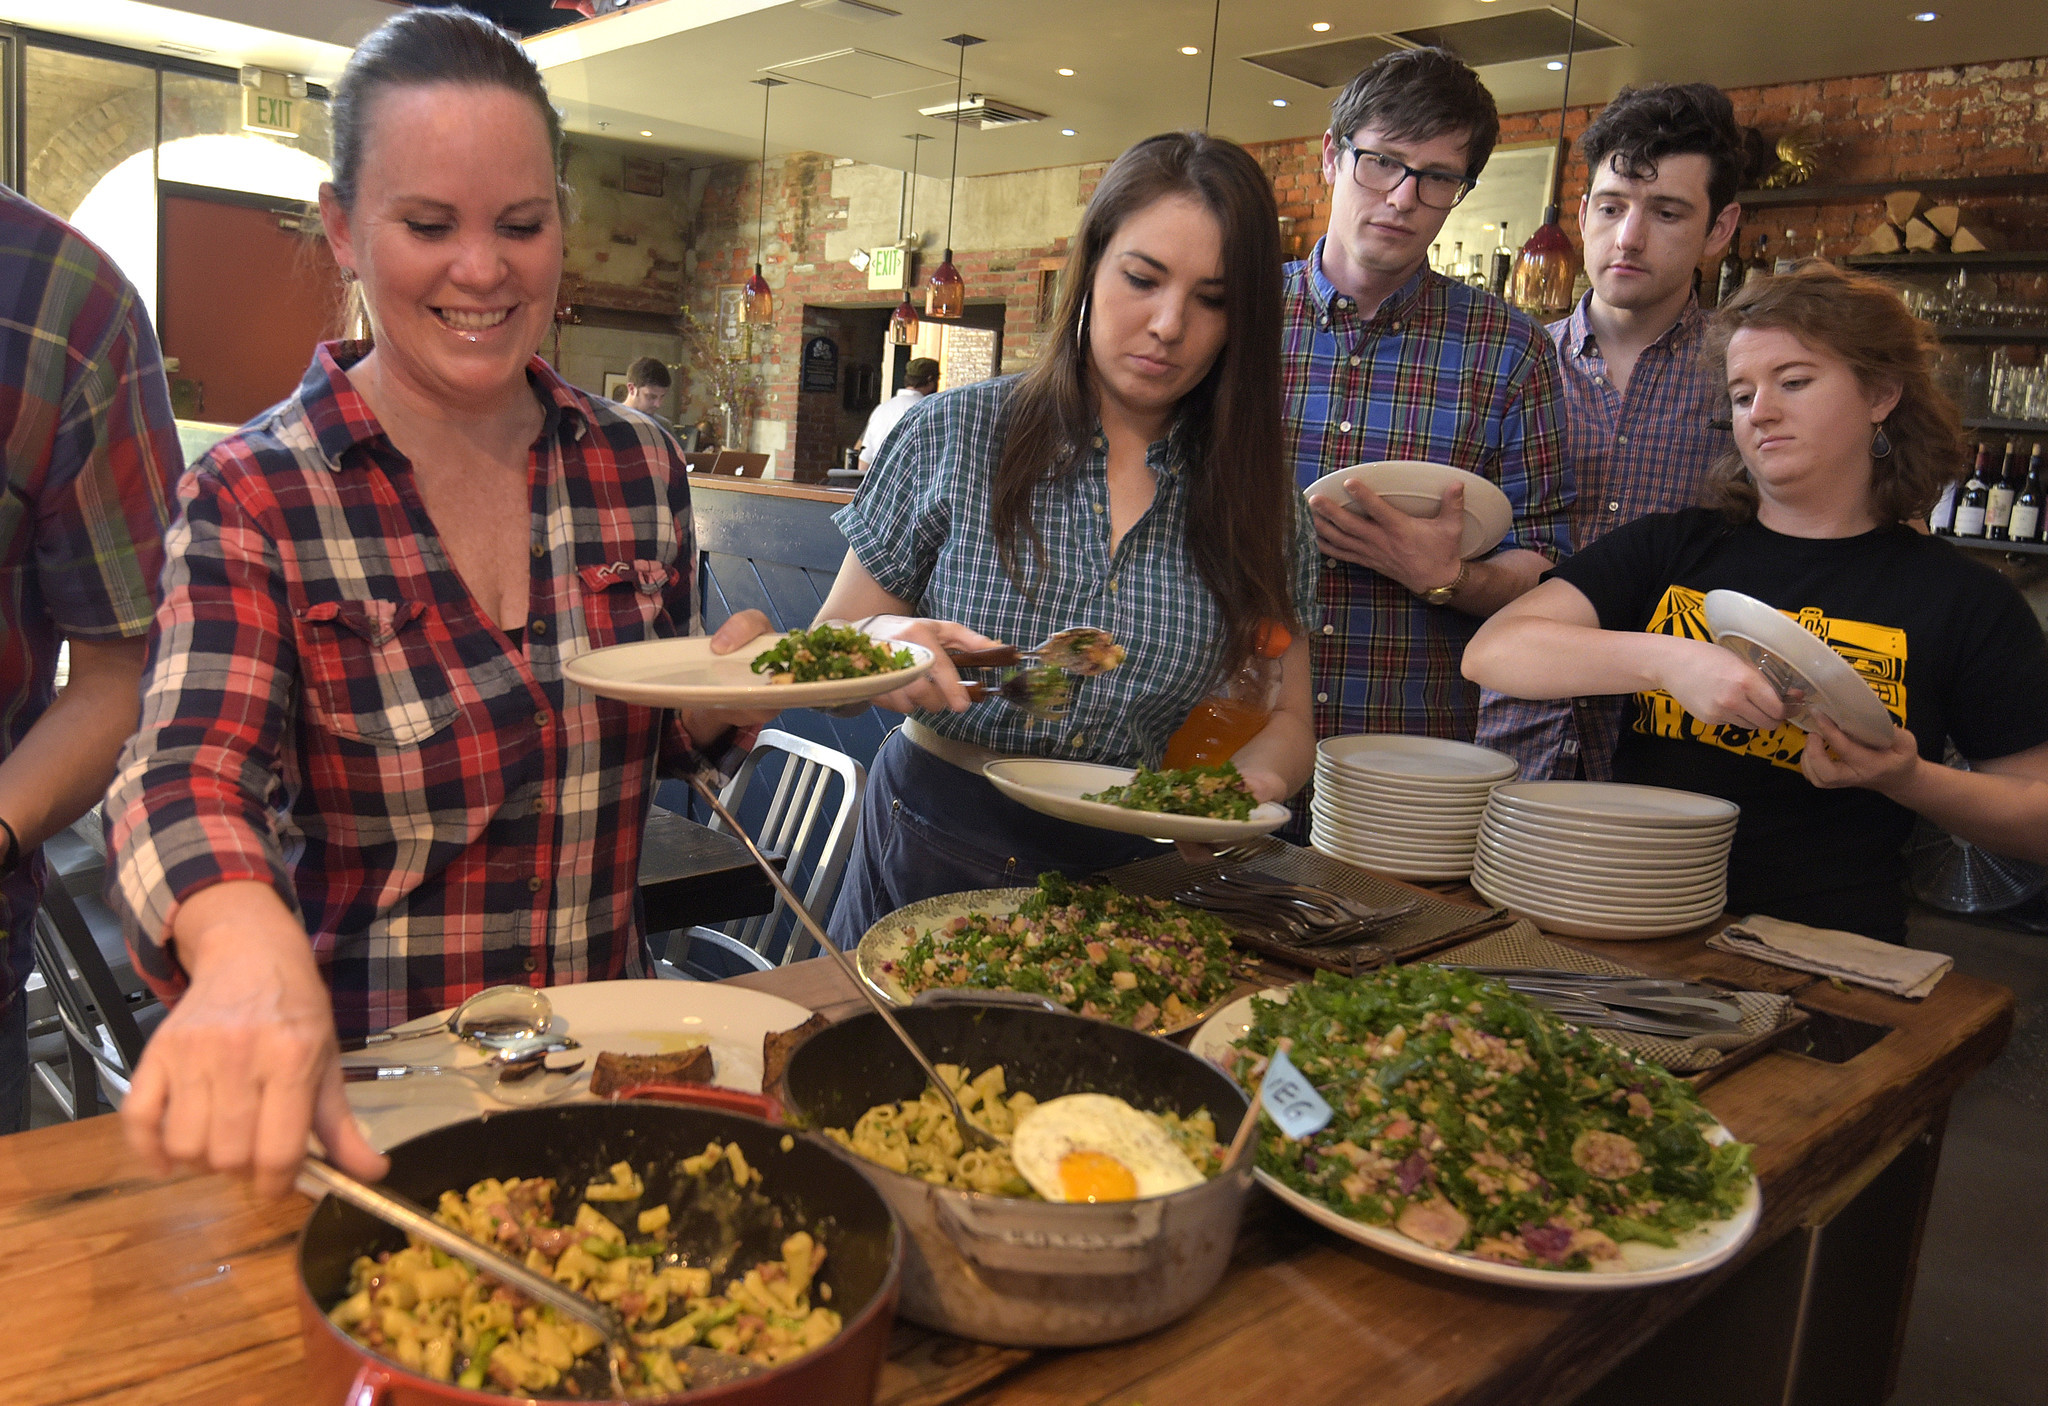 Baltimore Restaurant Staffs Bond Get Creative With Family Meal Sun